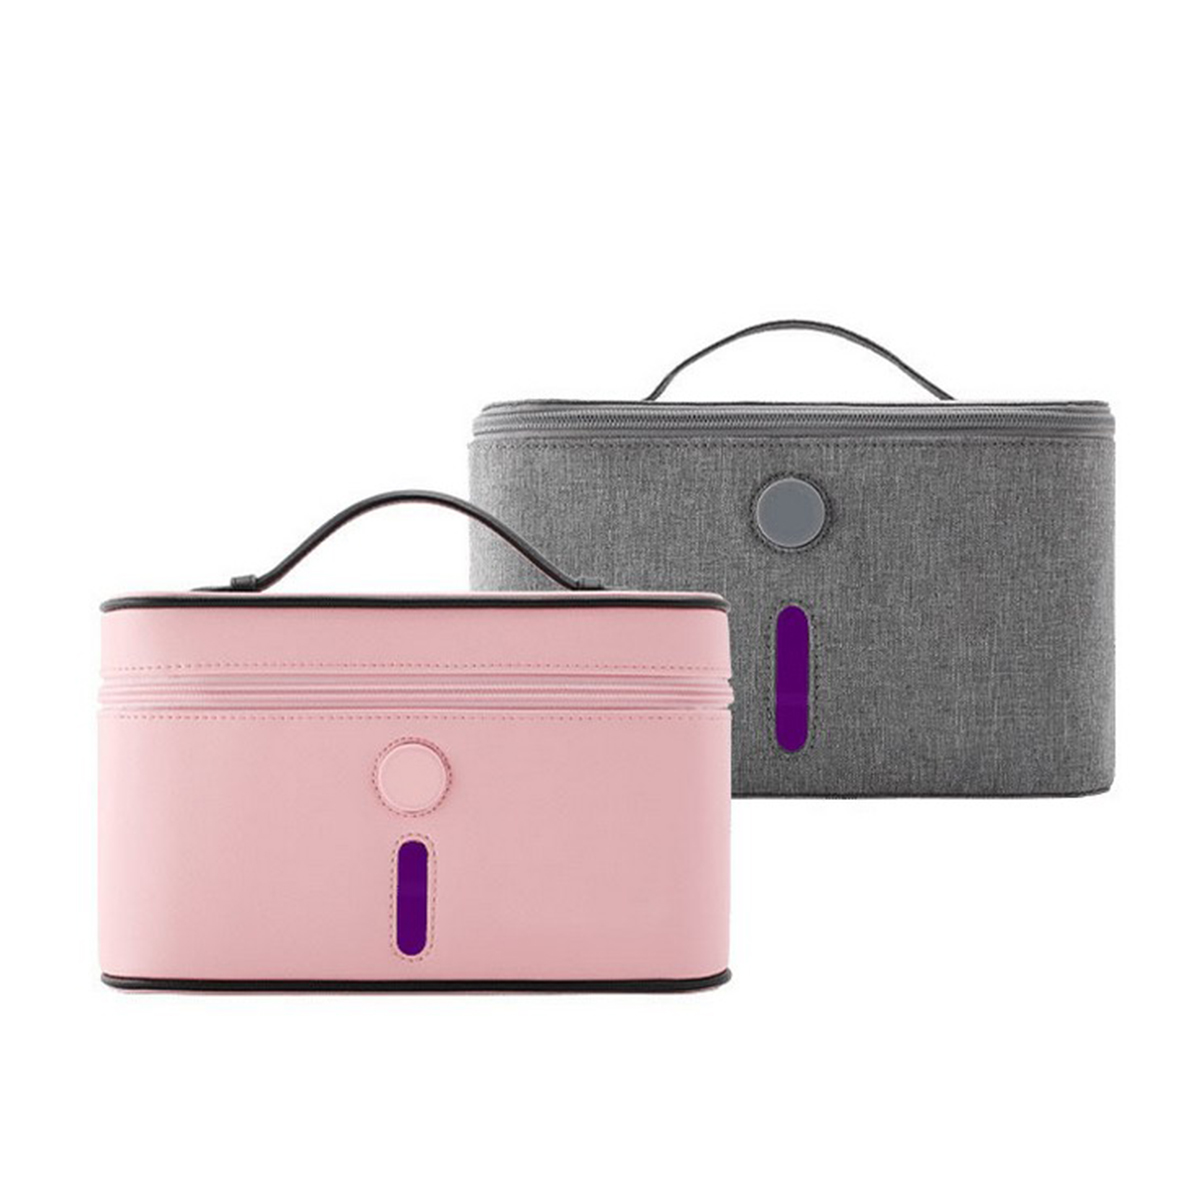 Led Baby Sterilization Bag 13 Lamp UVC Deep UV Disinfection Box UVC Disinfection Bag Sanitizer Kills 99.9% Of Germs